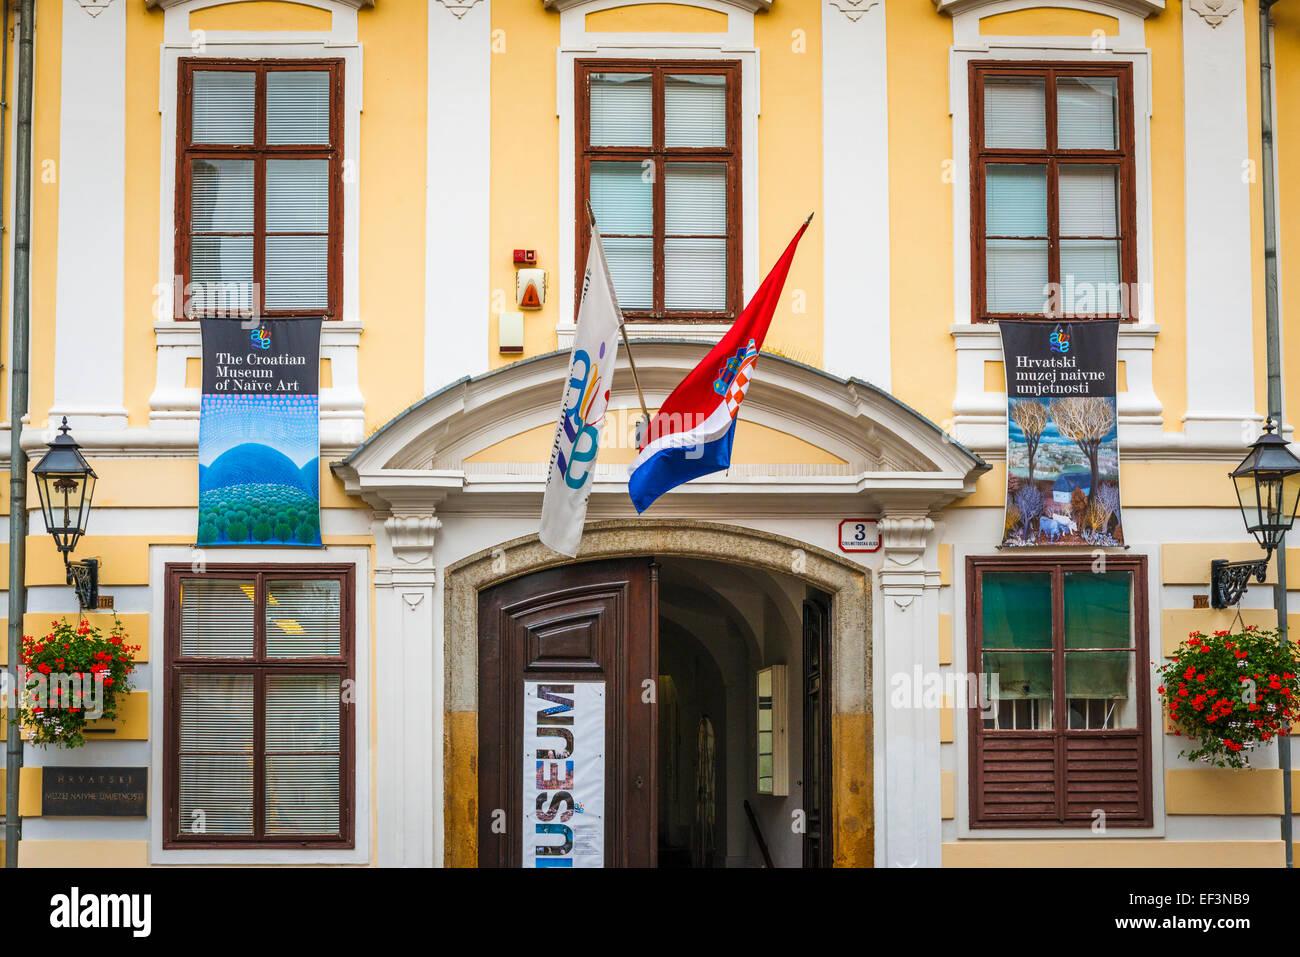 The Croatian Museum of Naive Art in old town Gradec, Zagreb, Croatia - Stock Image